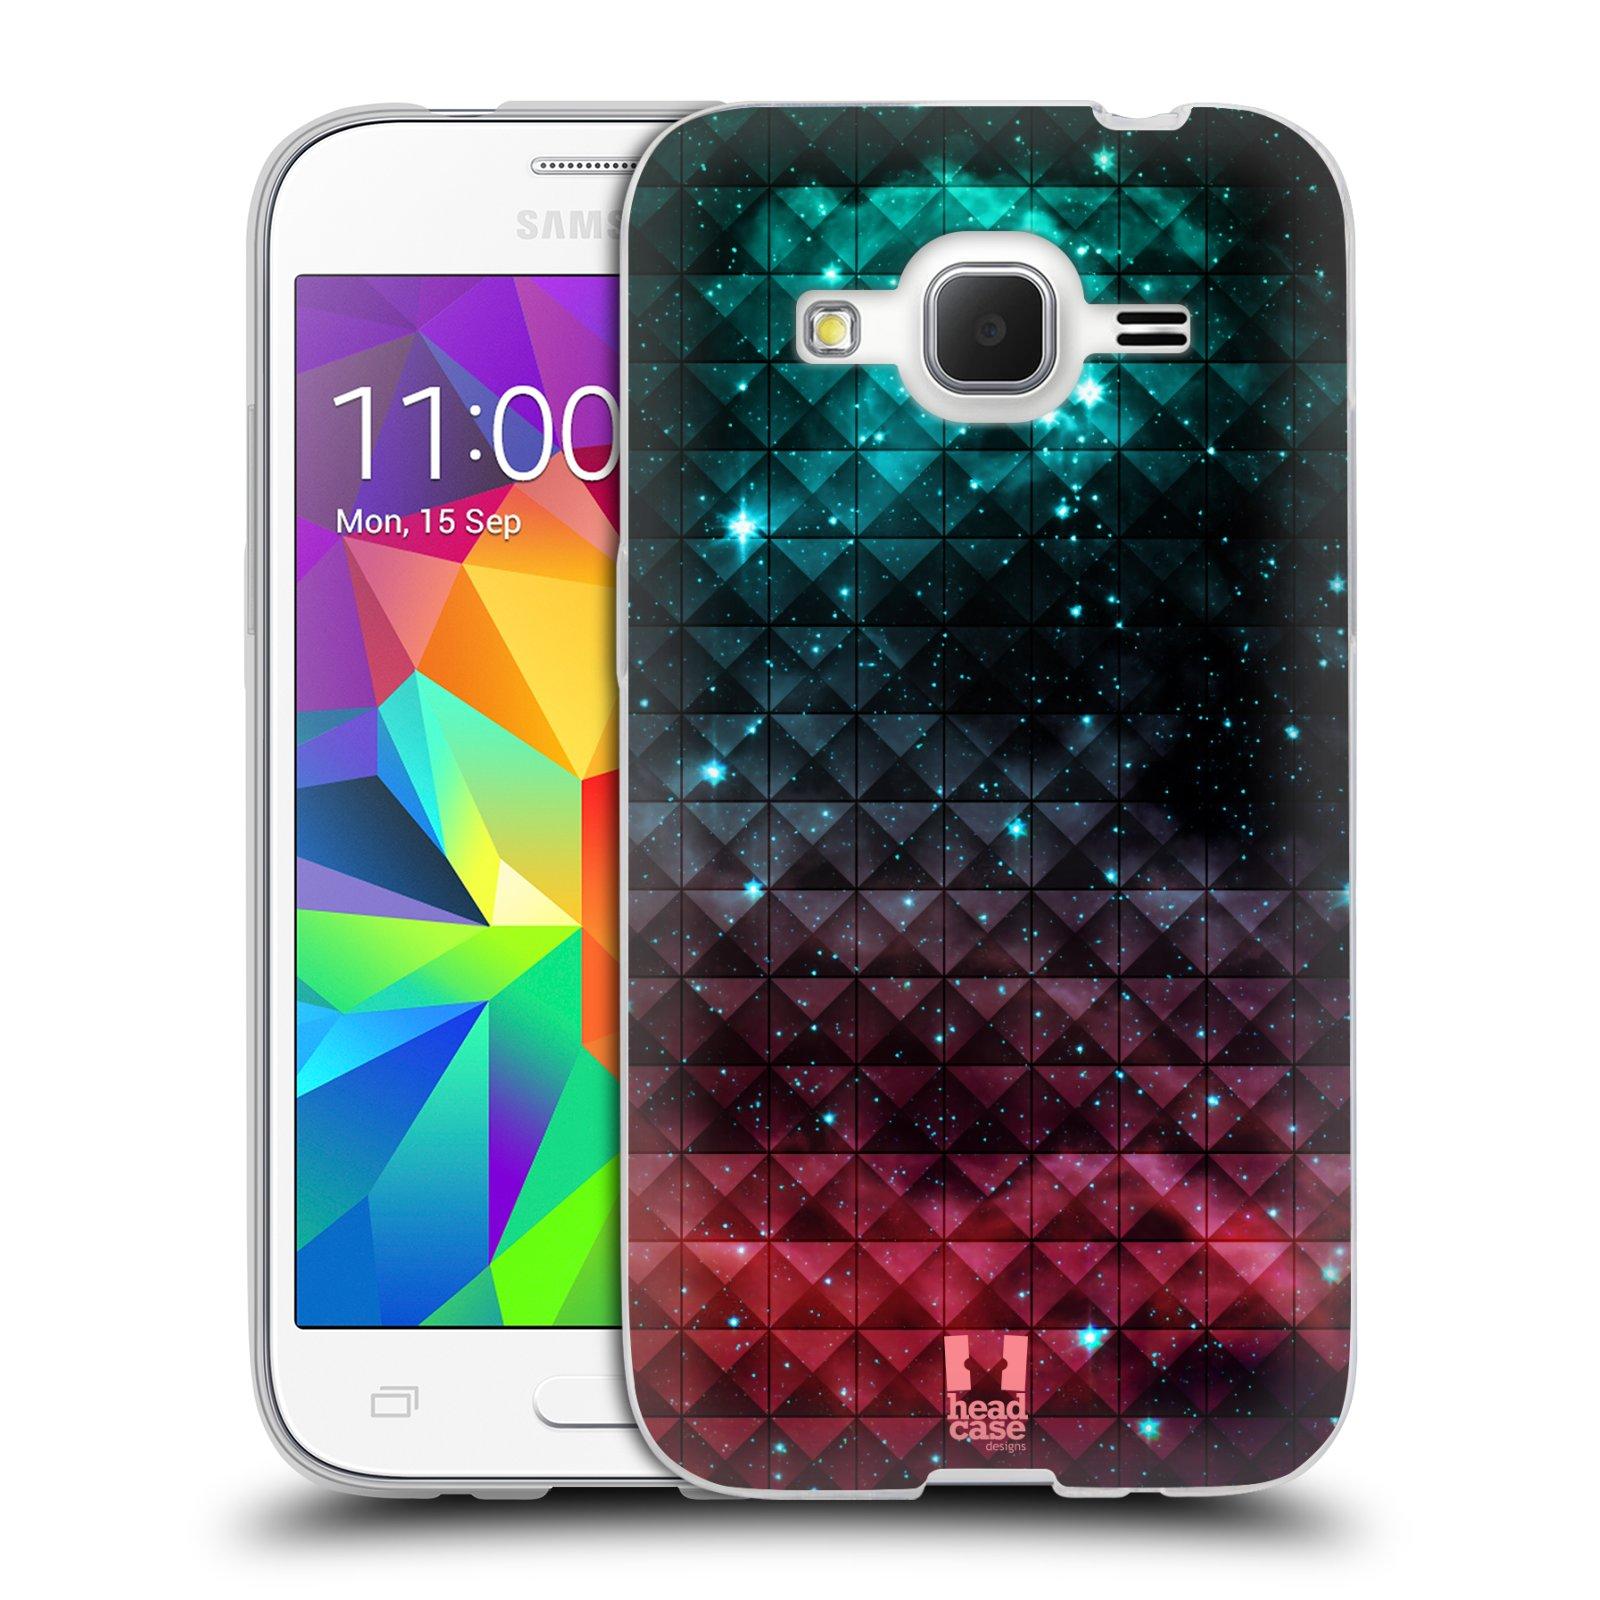 Silikonové pouzdro na mobil Samsung Galaxy Core Prime LTE HEAD CASE OMBRE SPARKLE (Silikonový kryt či obal na mobilní telefon Samsung Galaxy Core Prime LTE SM-G360)